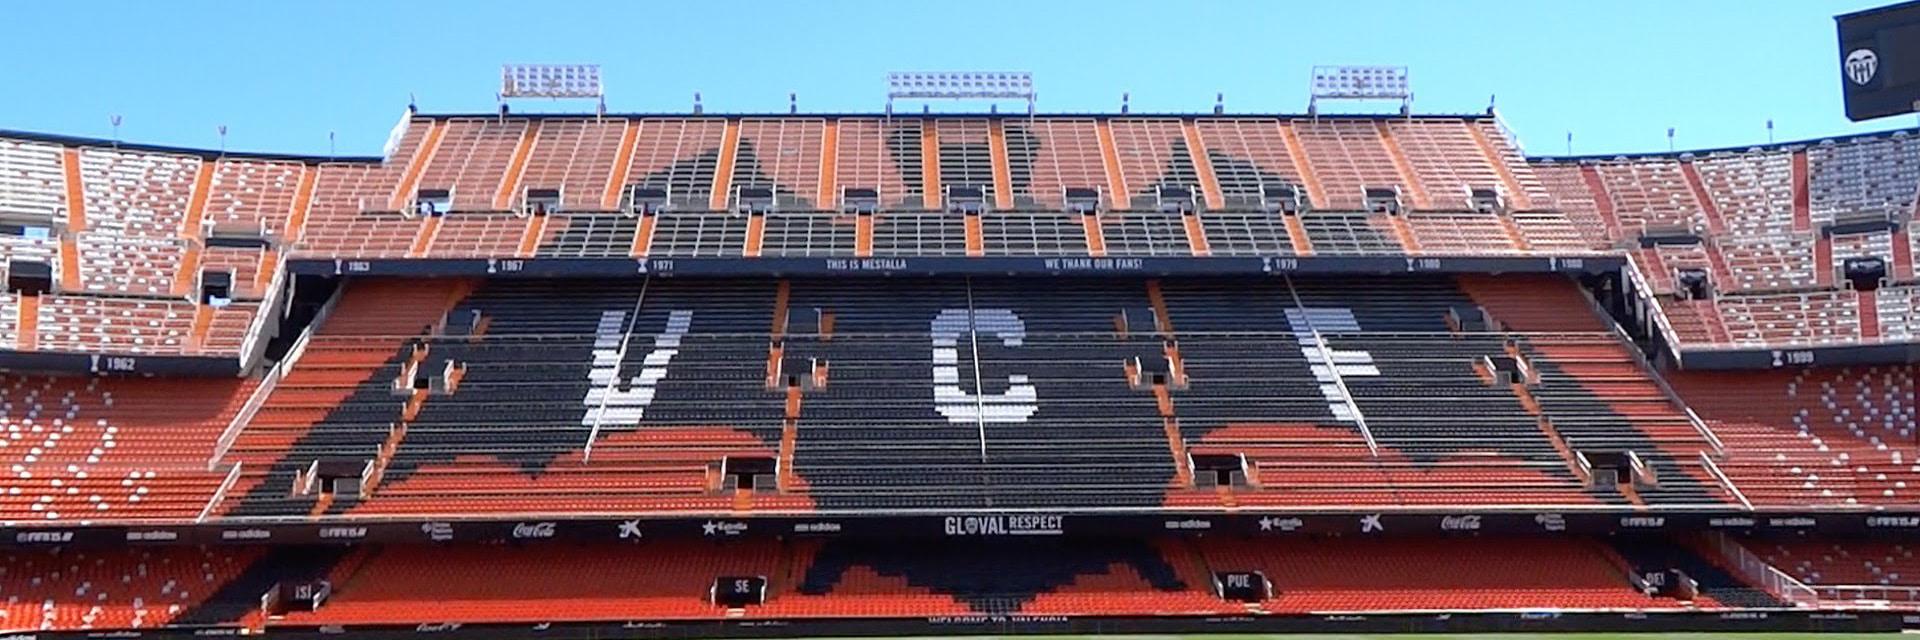 Valencia CF - FC Barcelona, 0 Januaryat 0:00